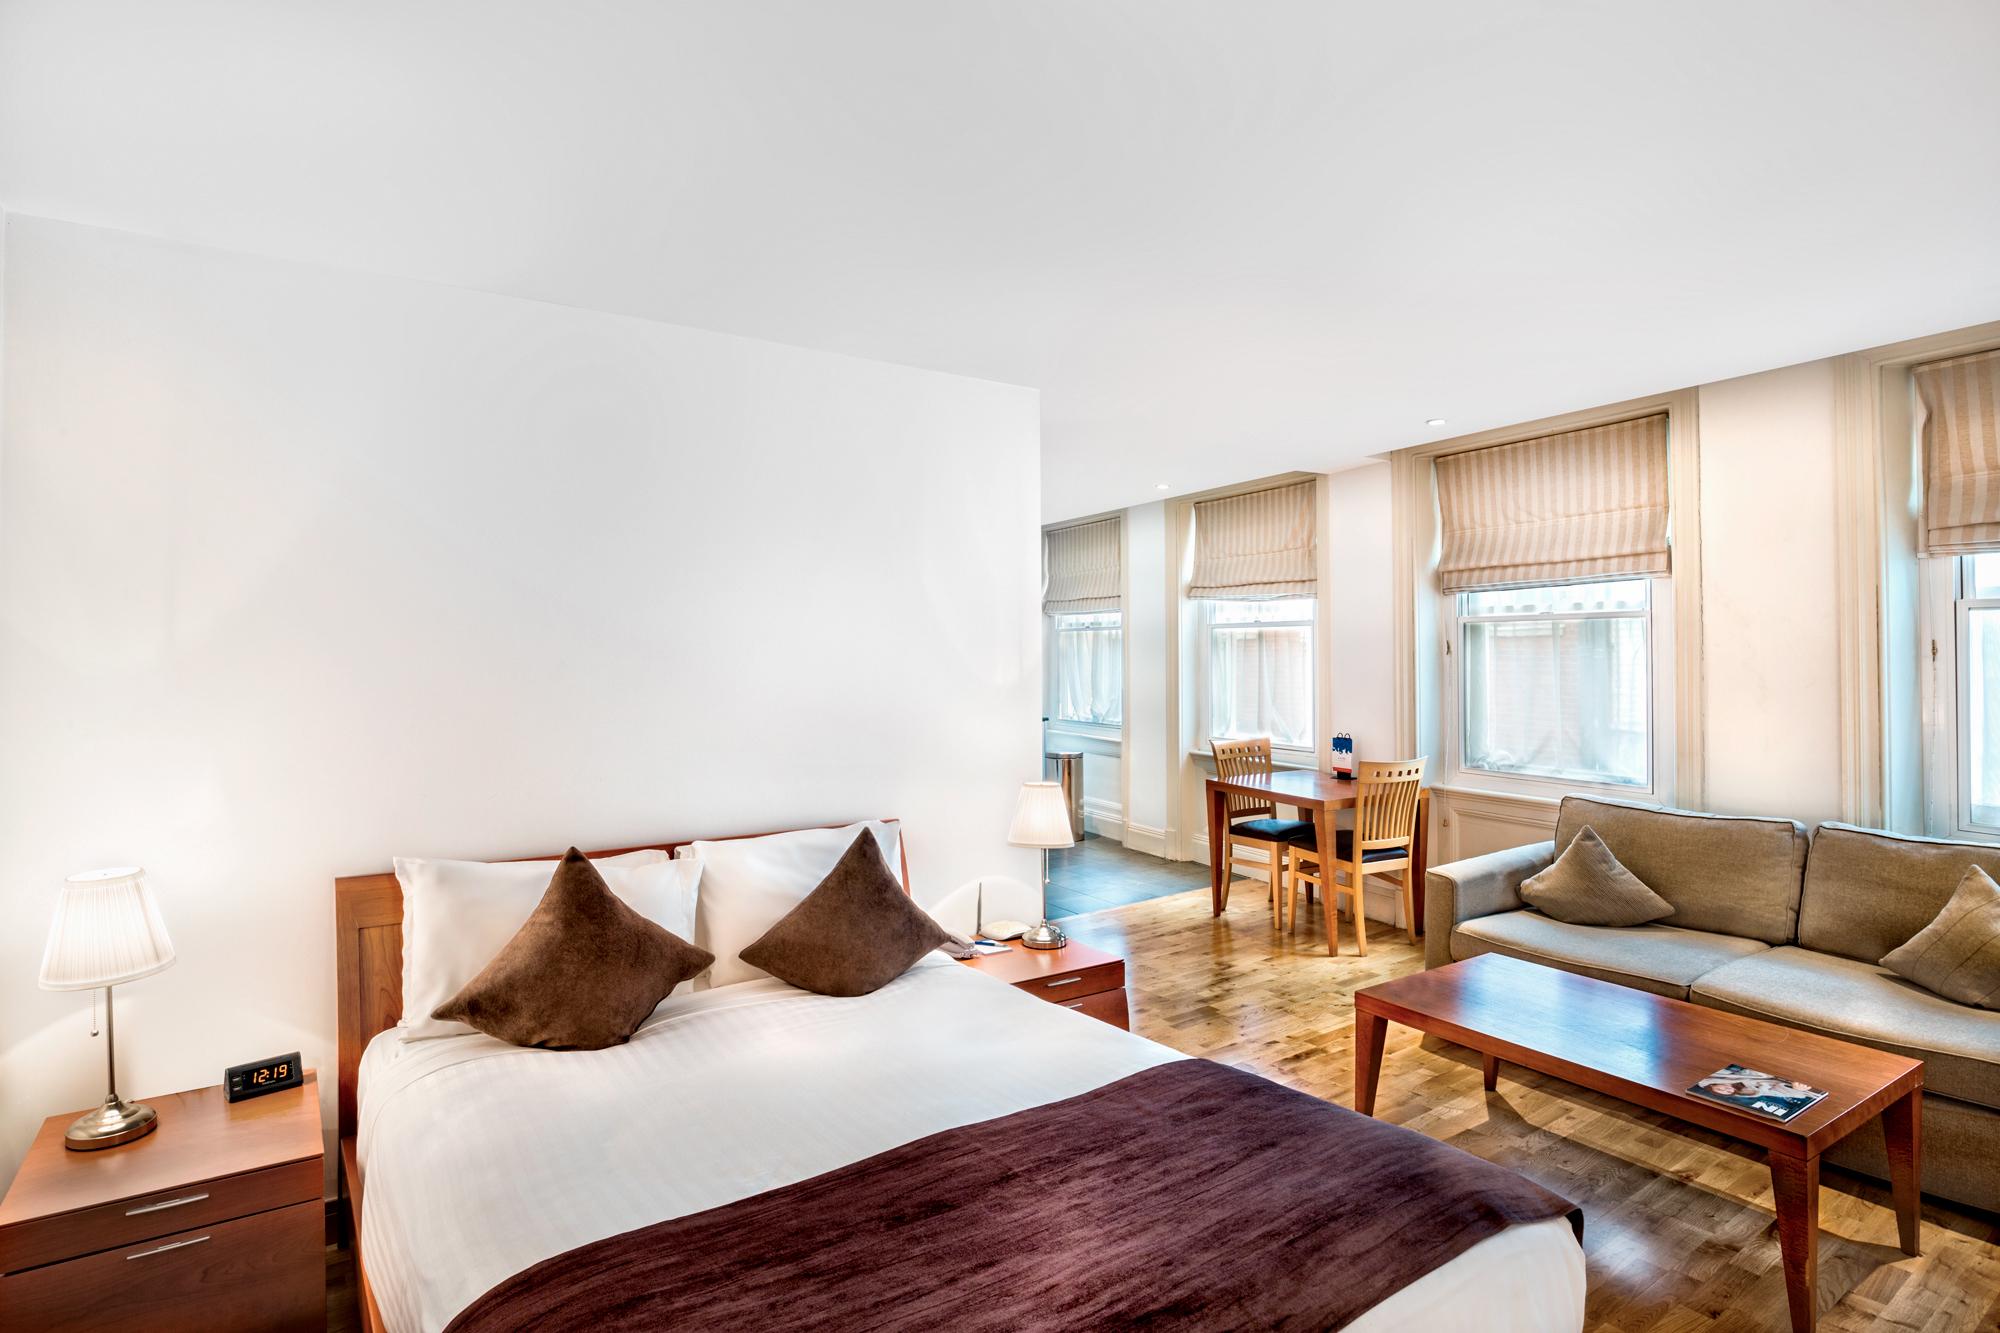 Hotel and interior photographer